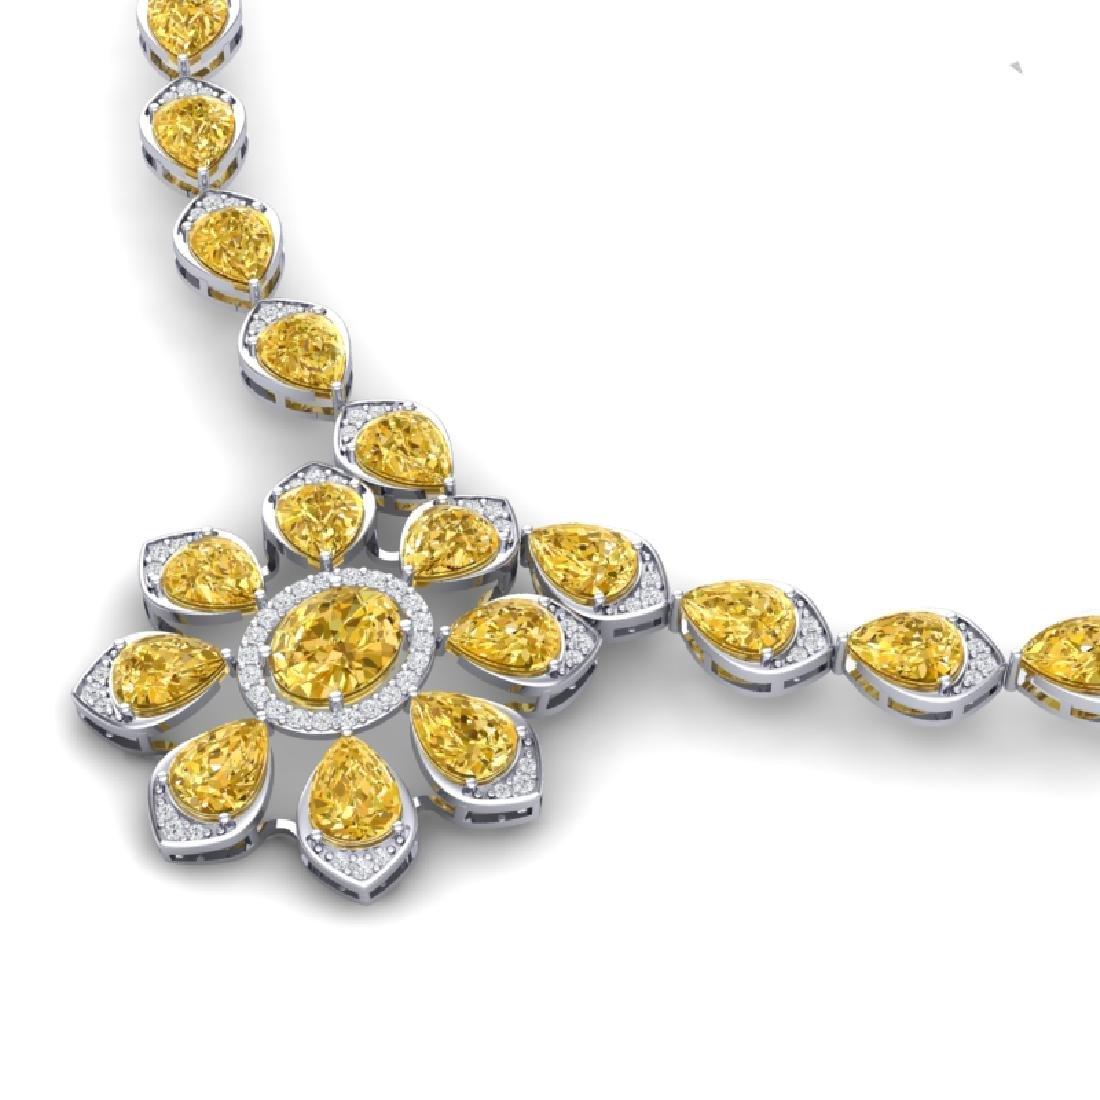 28.51 CTW Royalty Canary Citrine & VS Diamond Necklace - 2